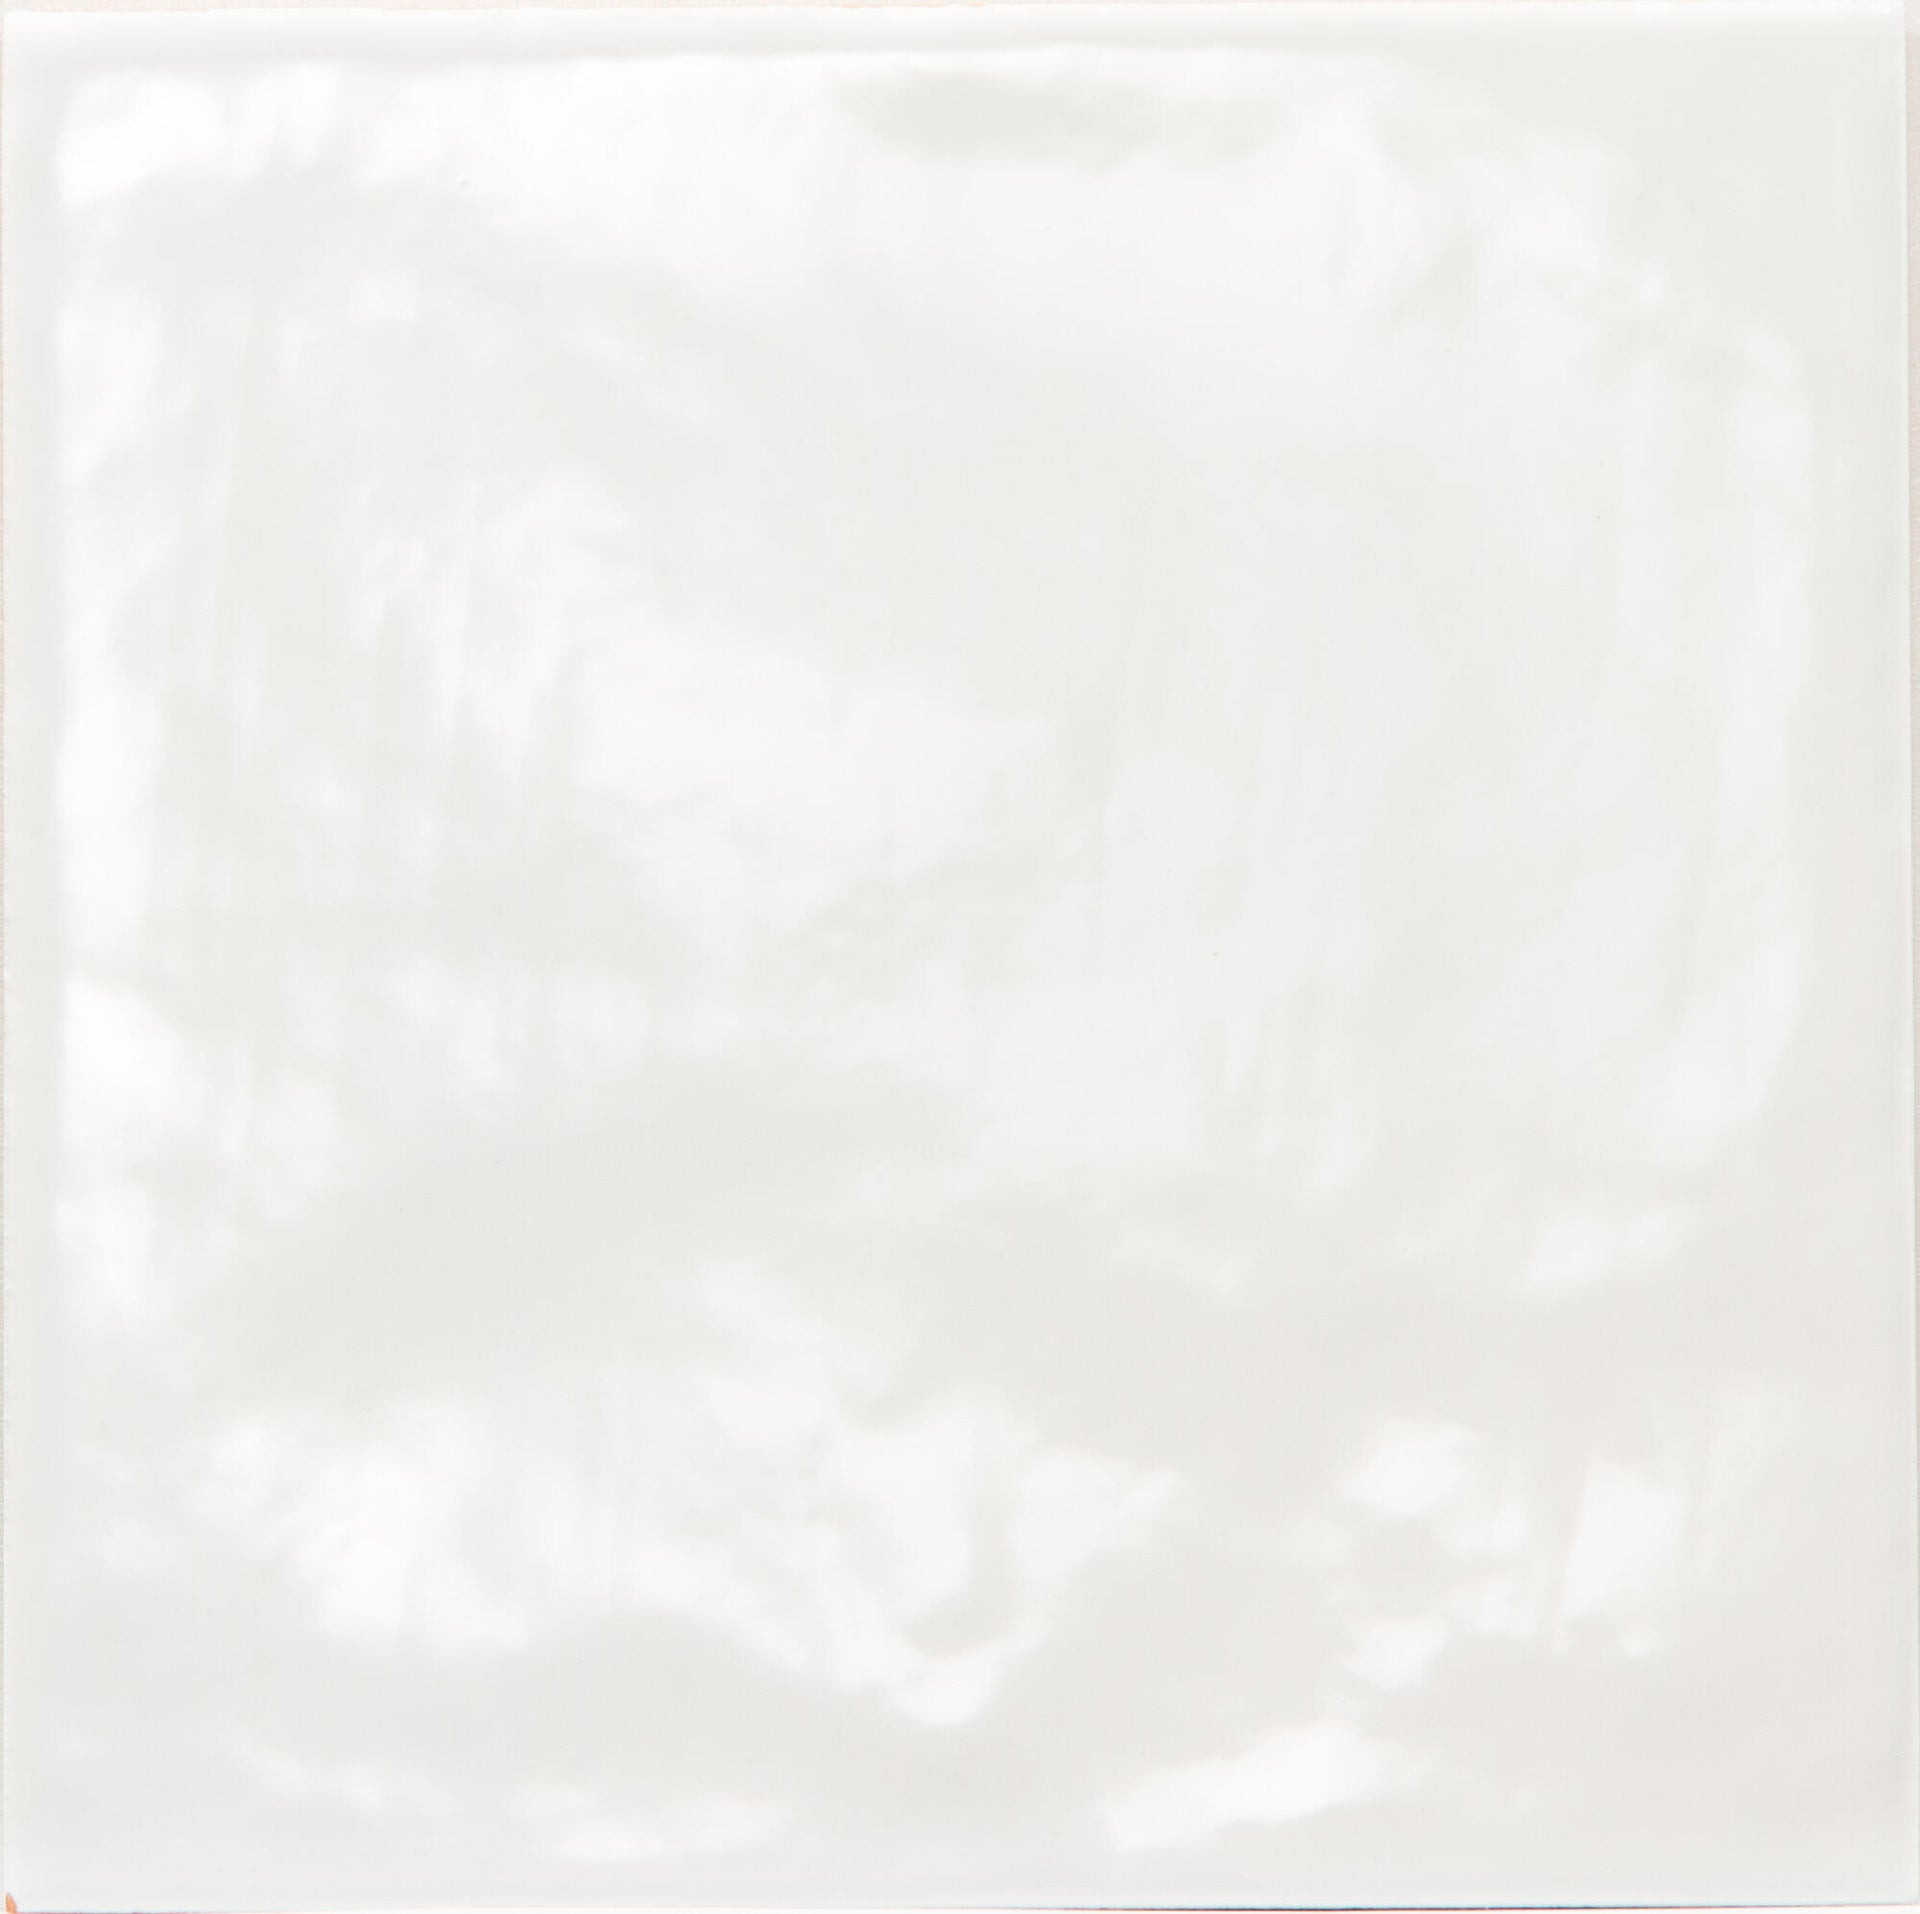 Piastrella per rivestimenti Patine 15 x 15 cm sp. 7 mm bianco - 4